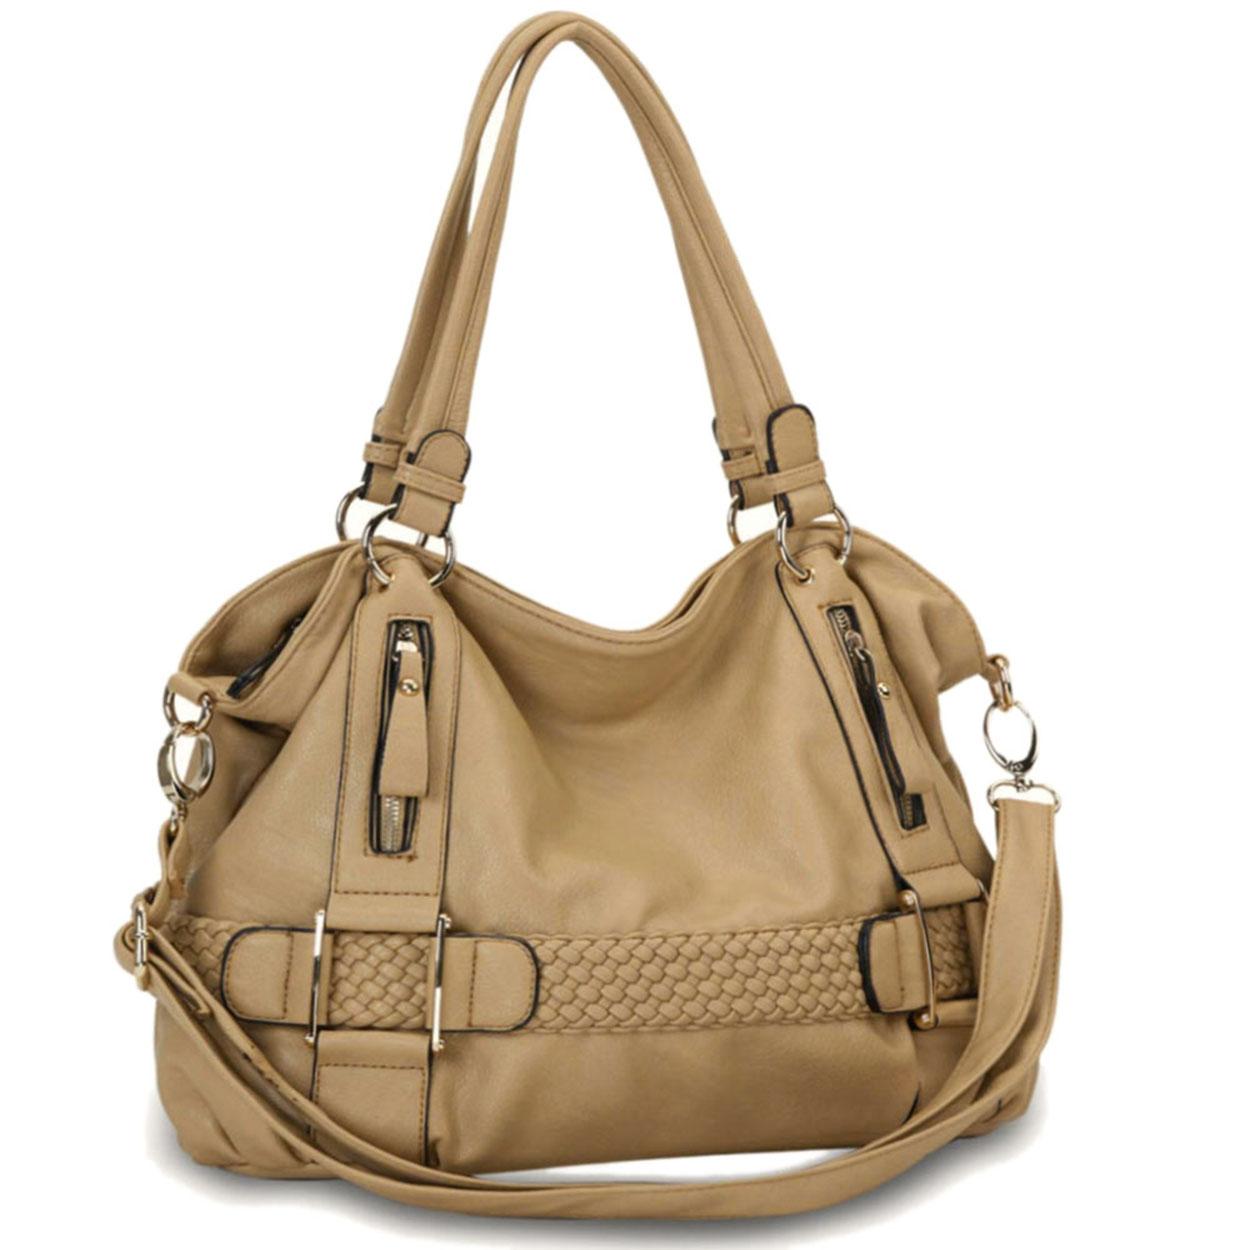 SAMANTHA Beige Soft Hobo handbag 1